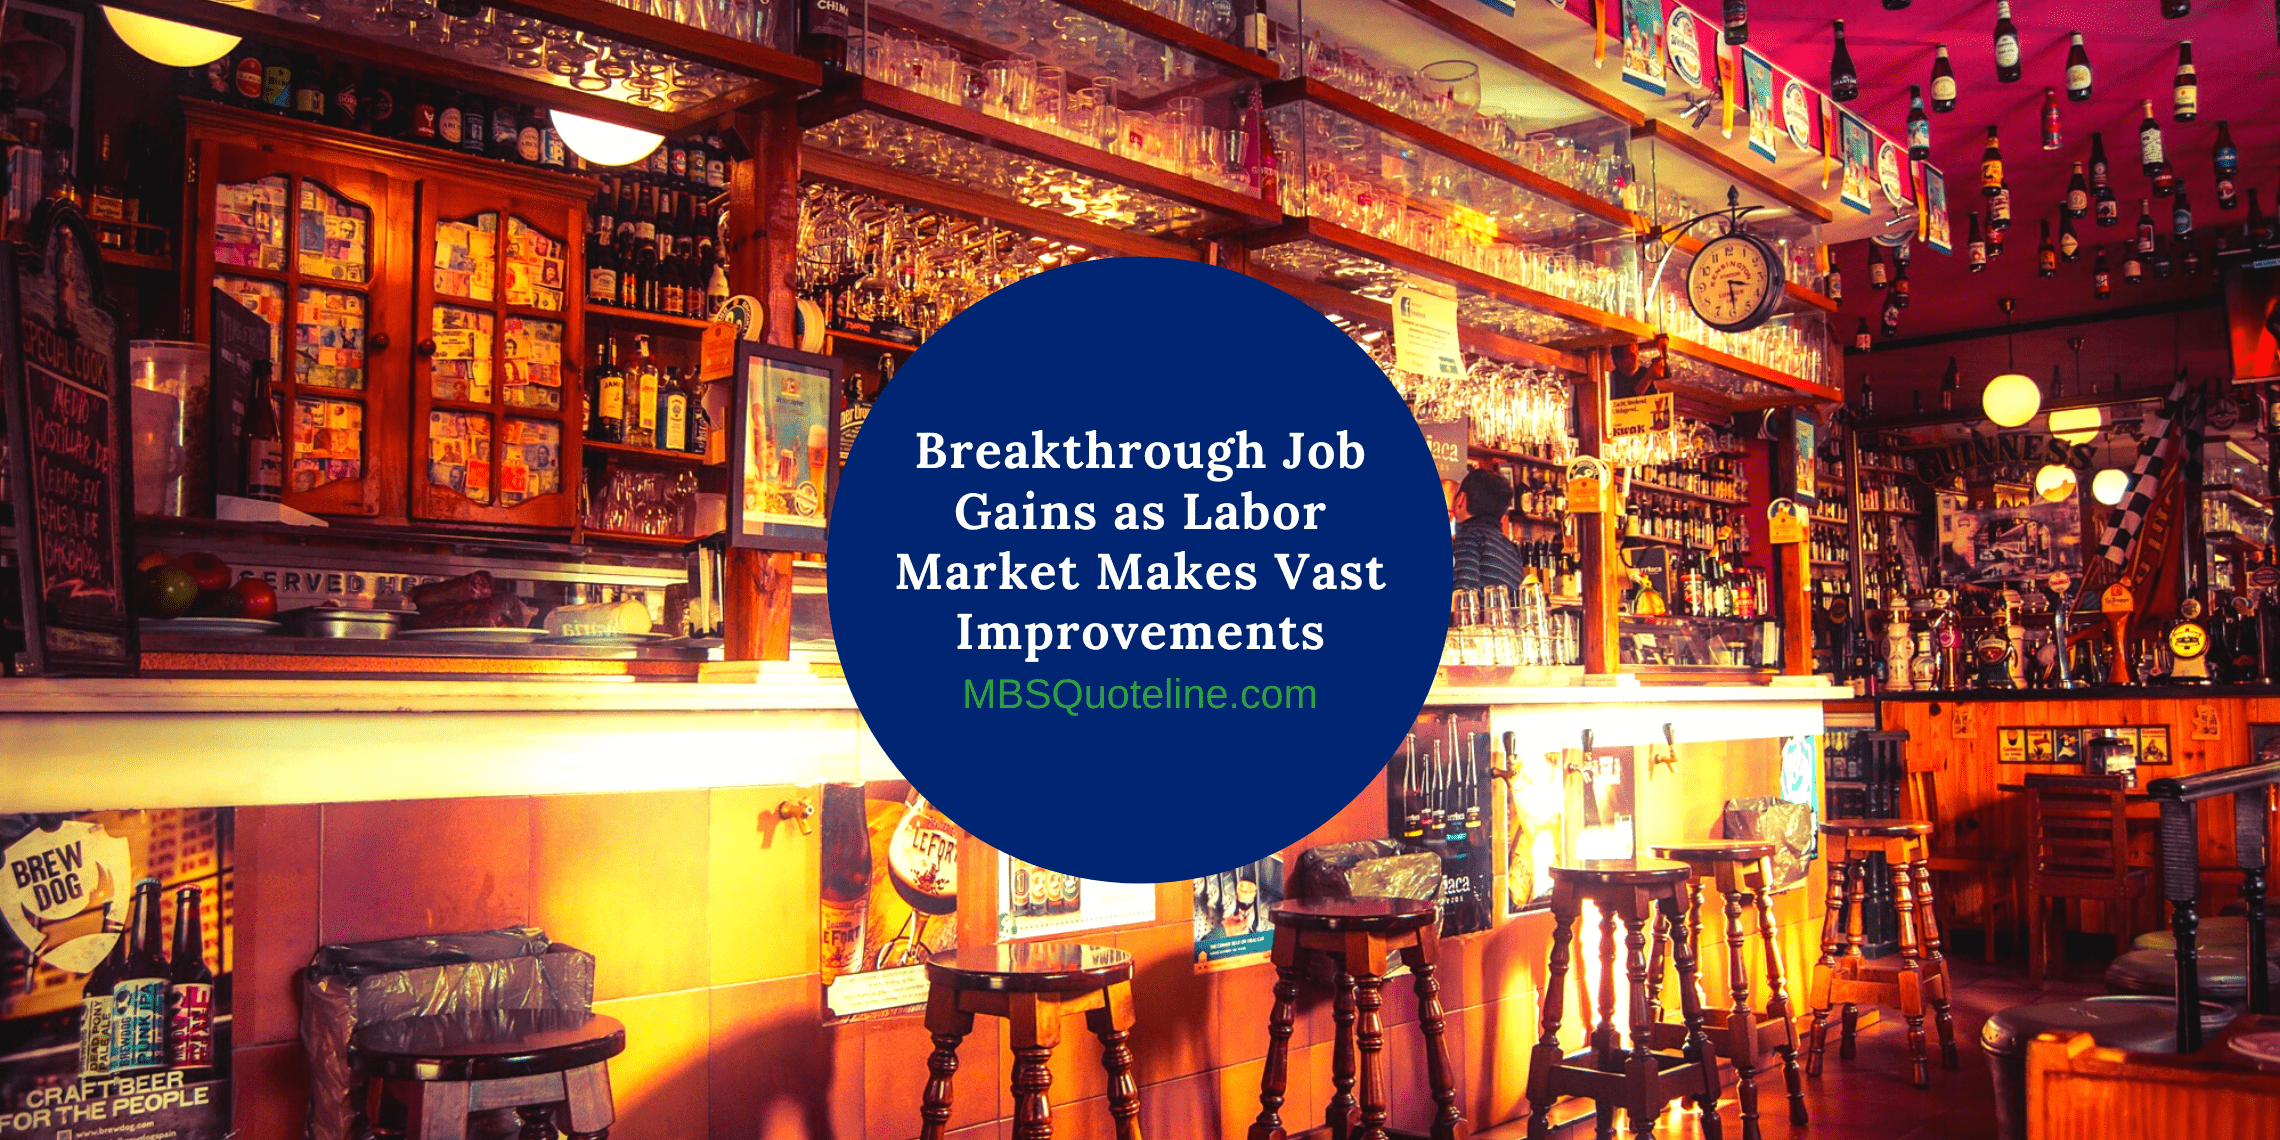 Breakthrough Job Gains as Labor Market Makes Vast Improvements mortgagetime mbsquoteline featured